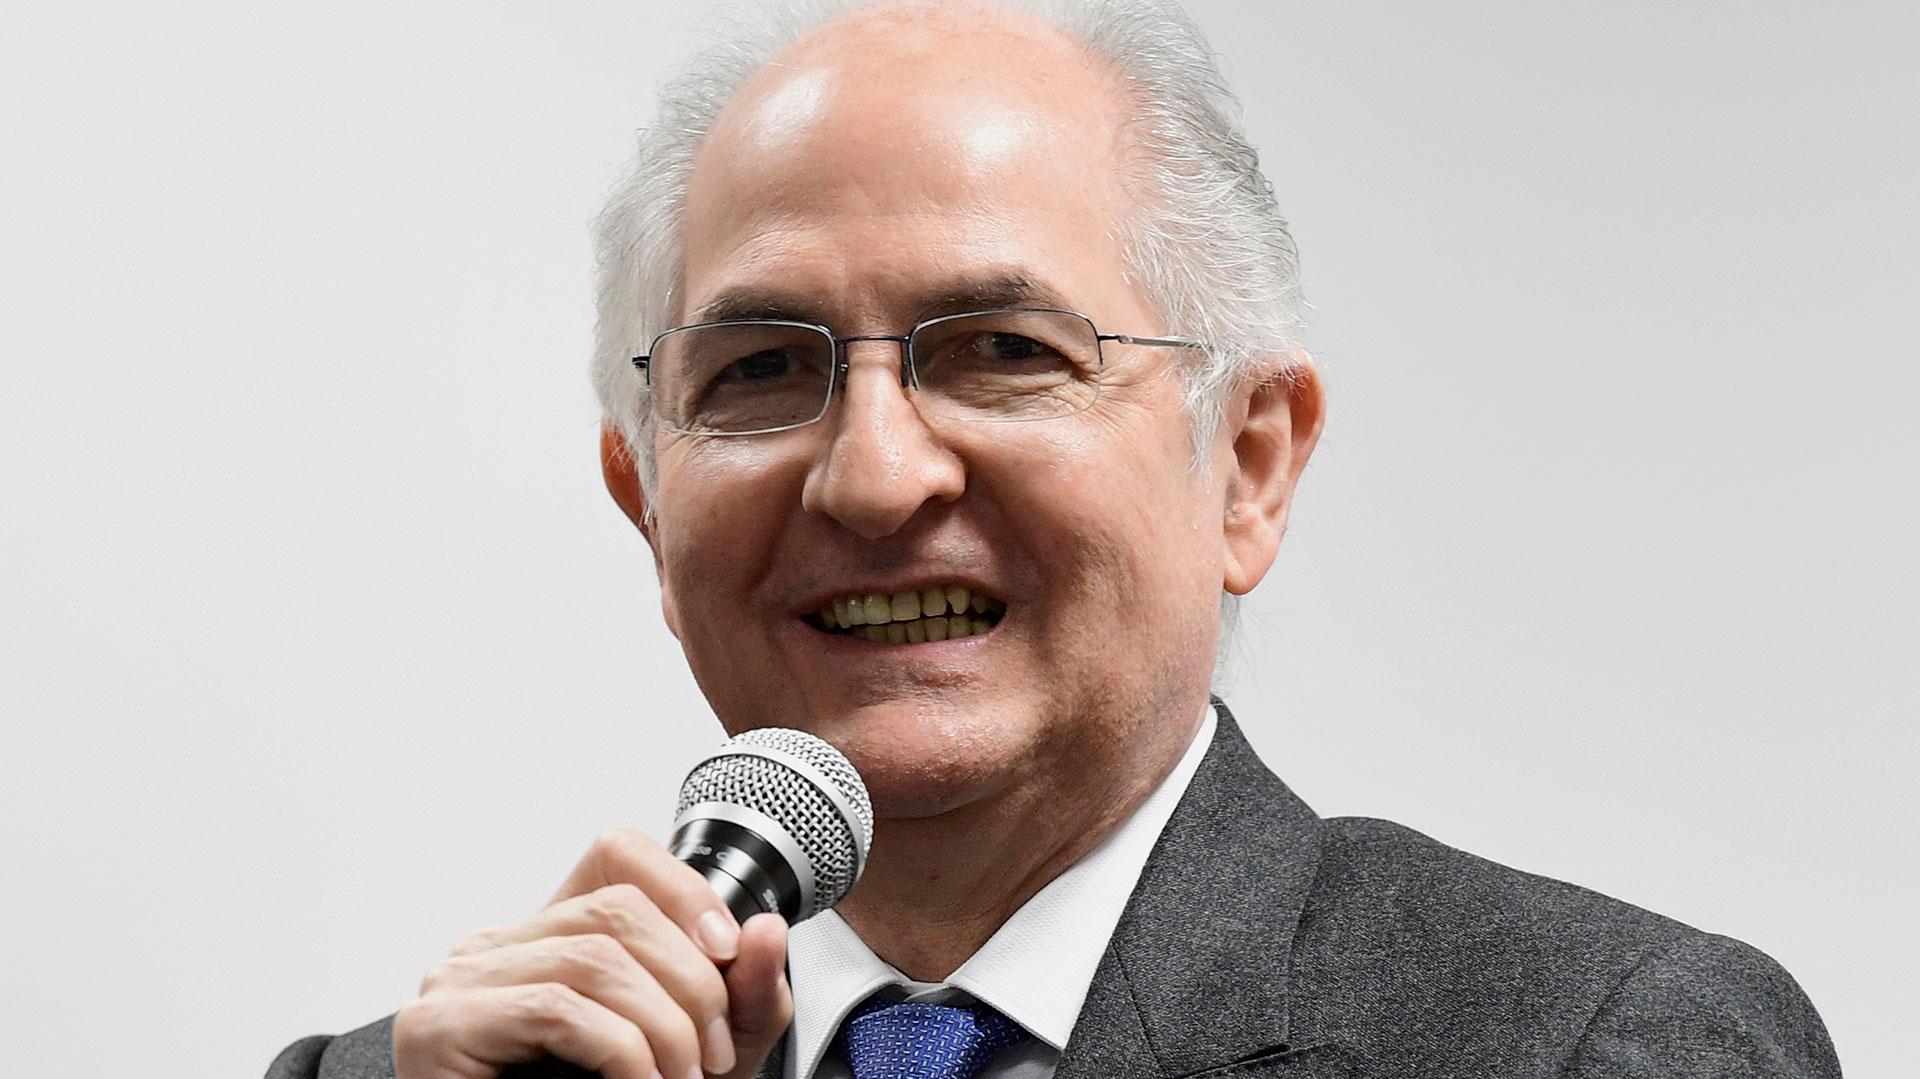 Antonio Ledezma (AFP)